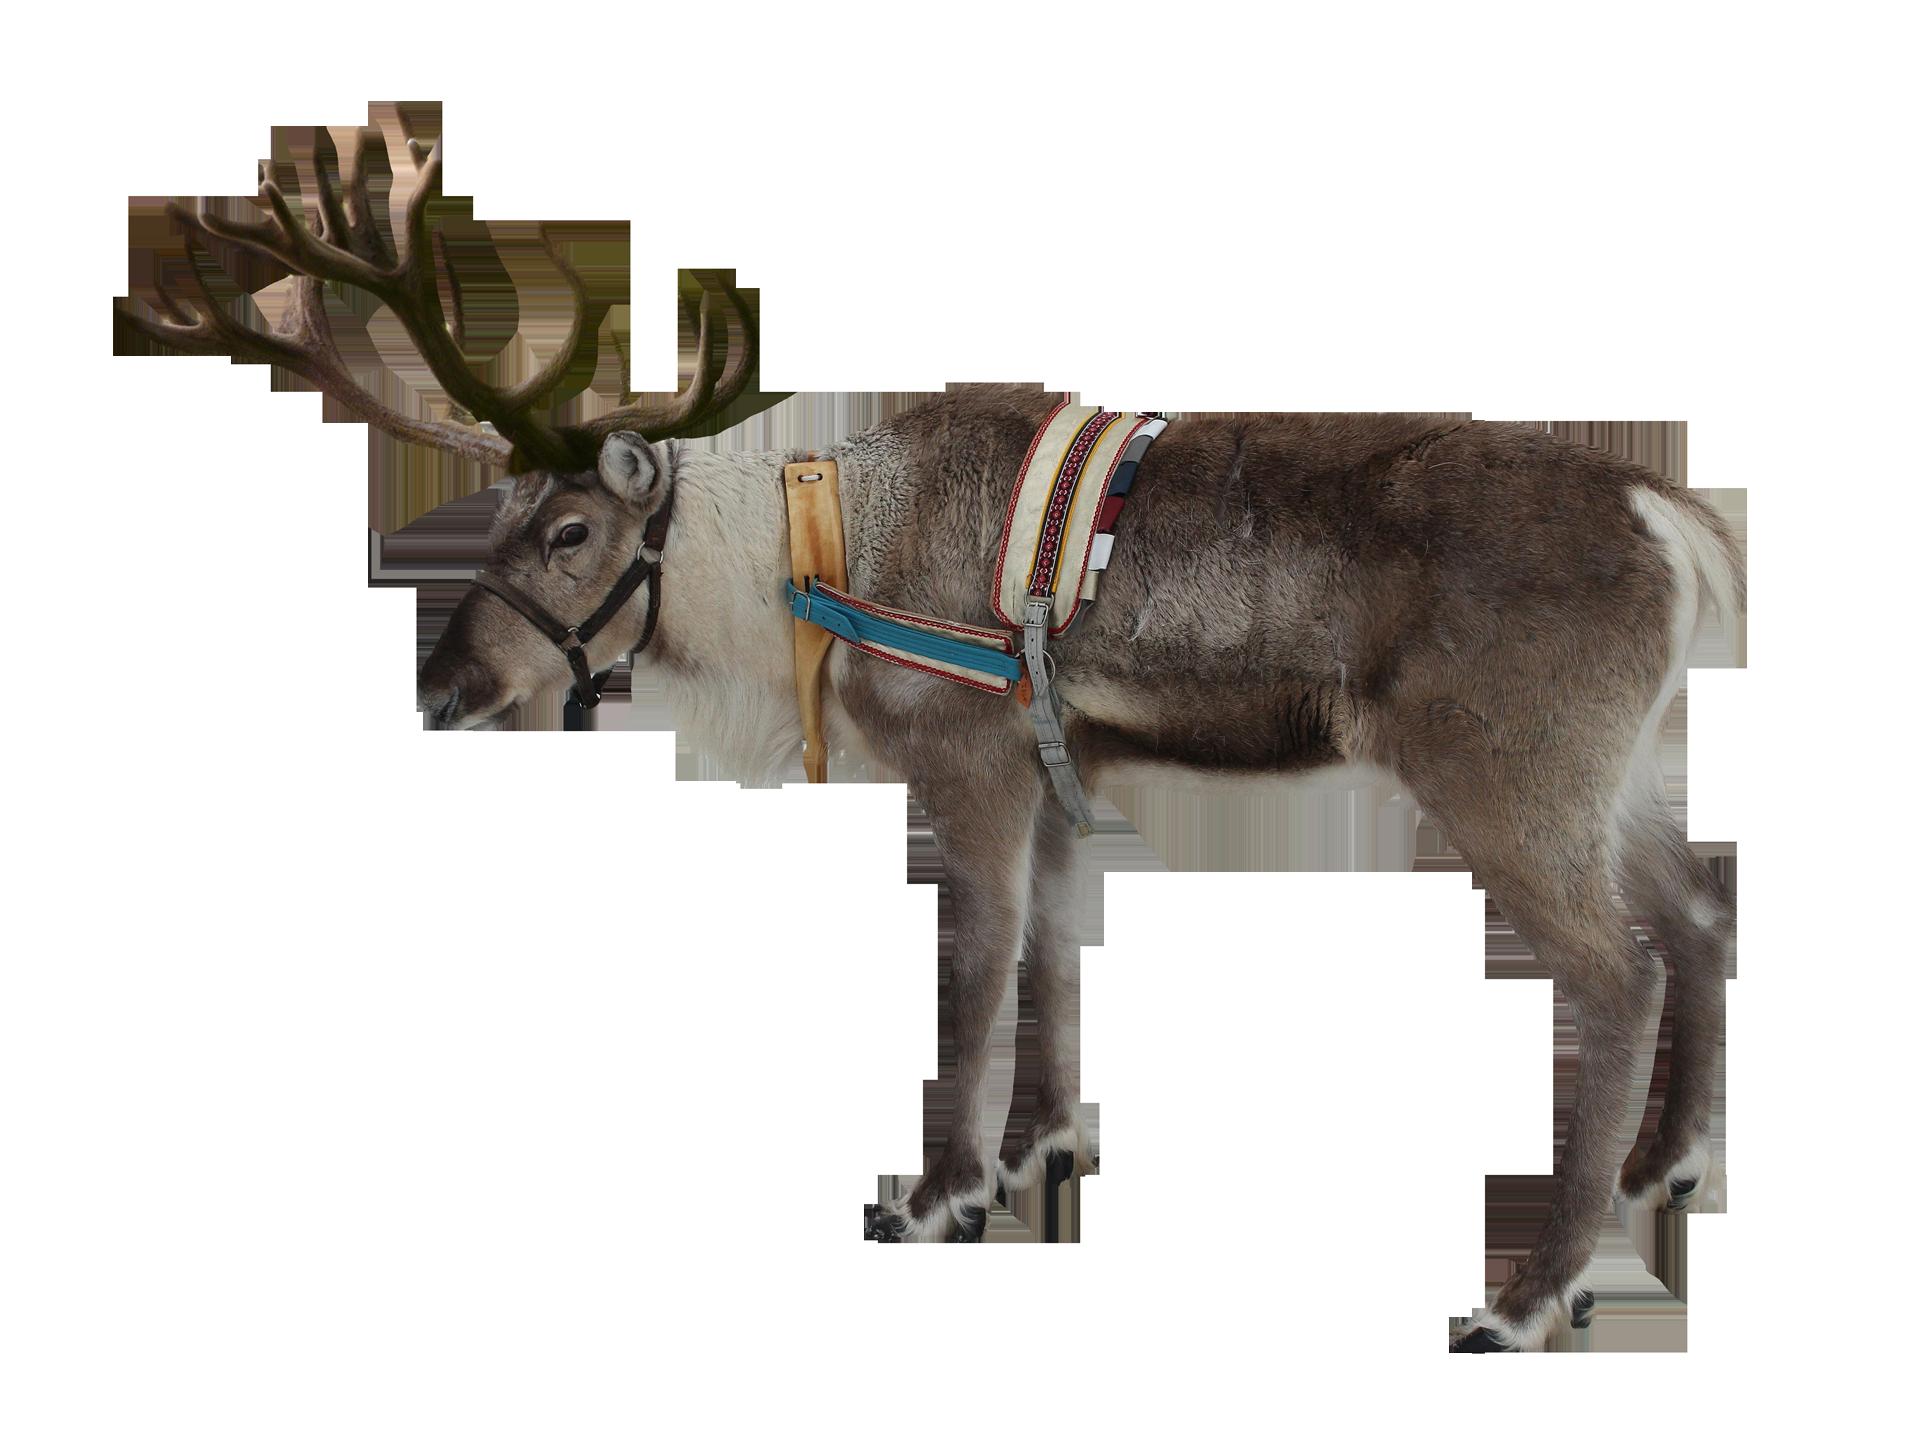 Reindeer PNG Image - PurePNG | Free transparent CC0 PNG ...